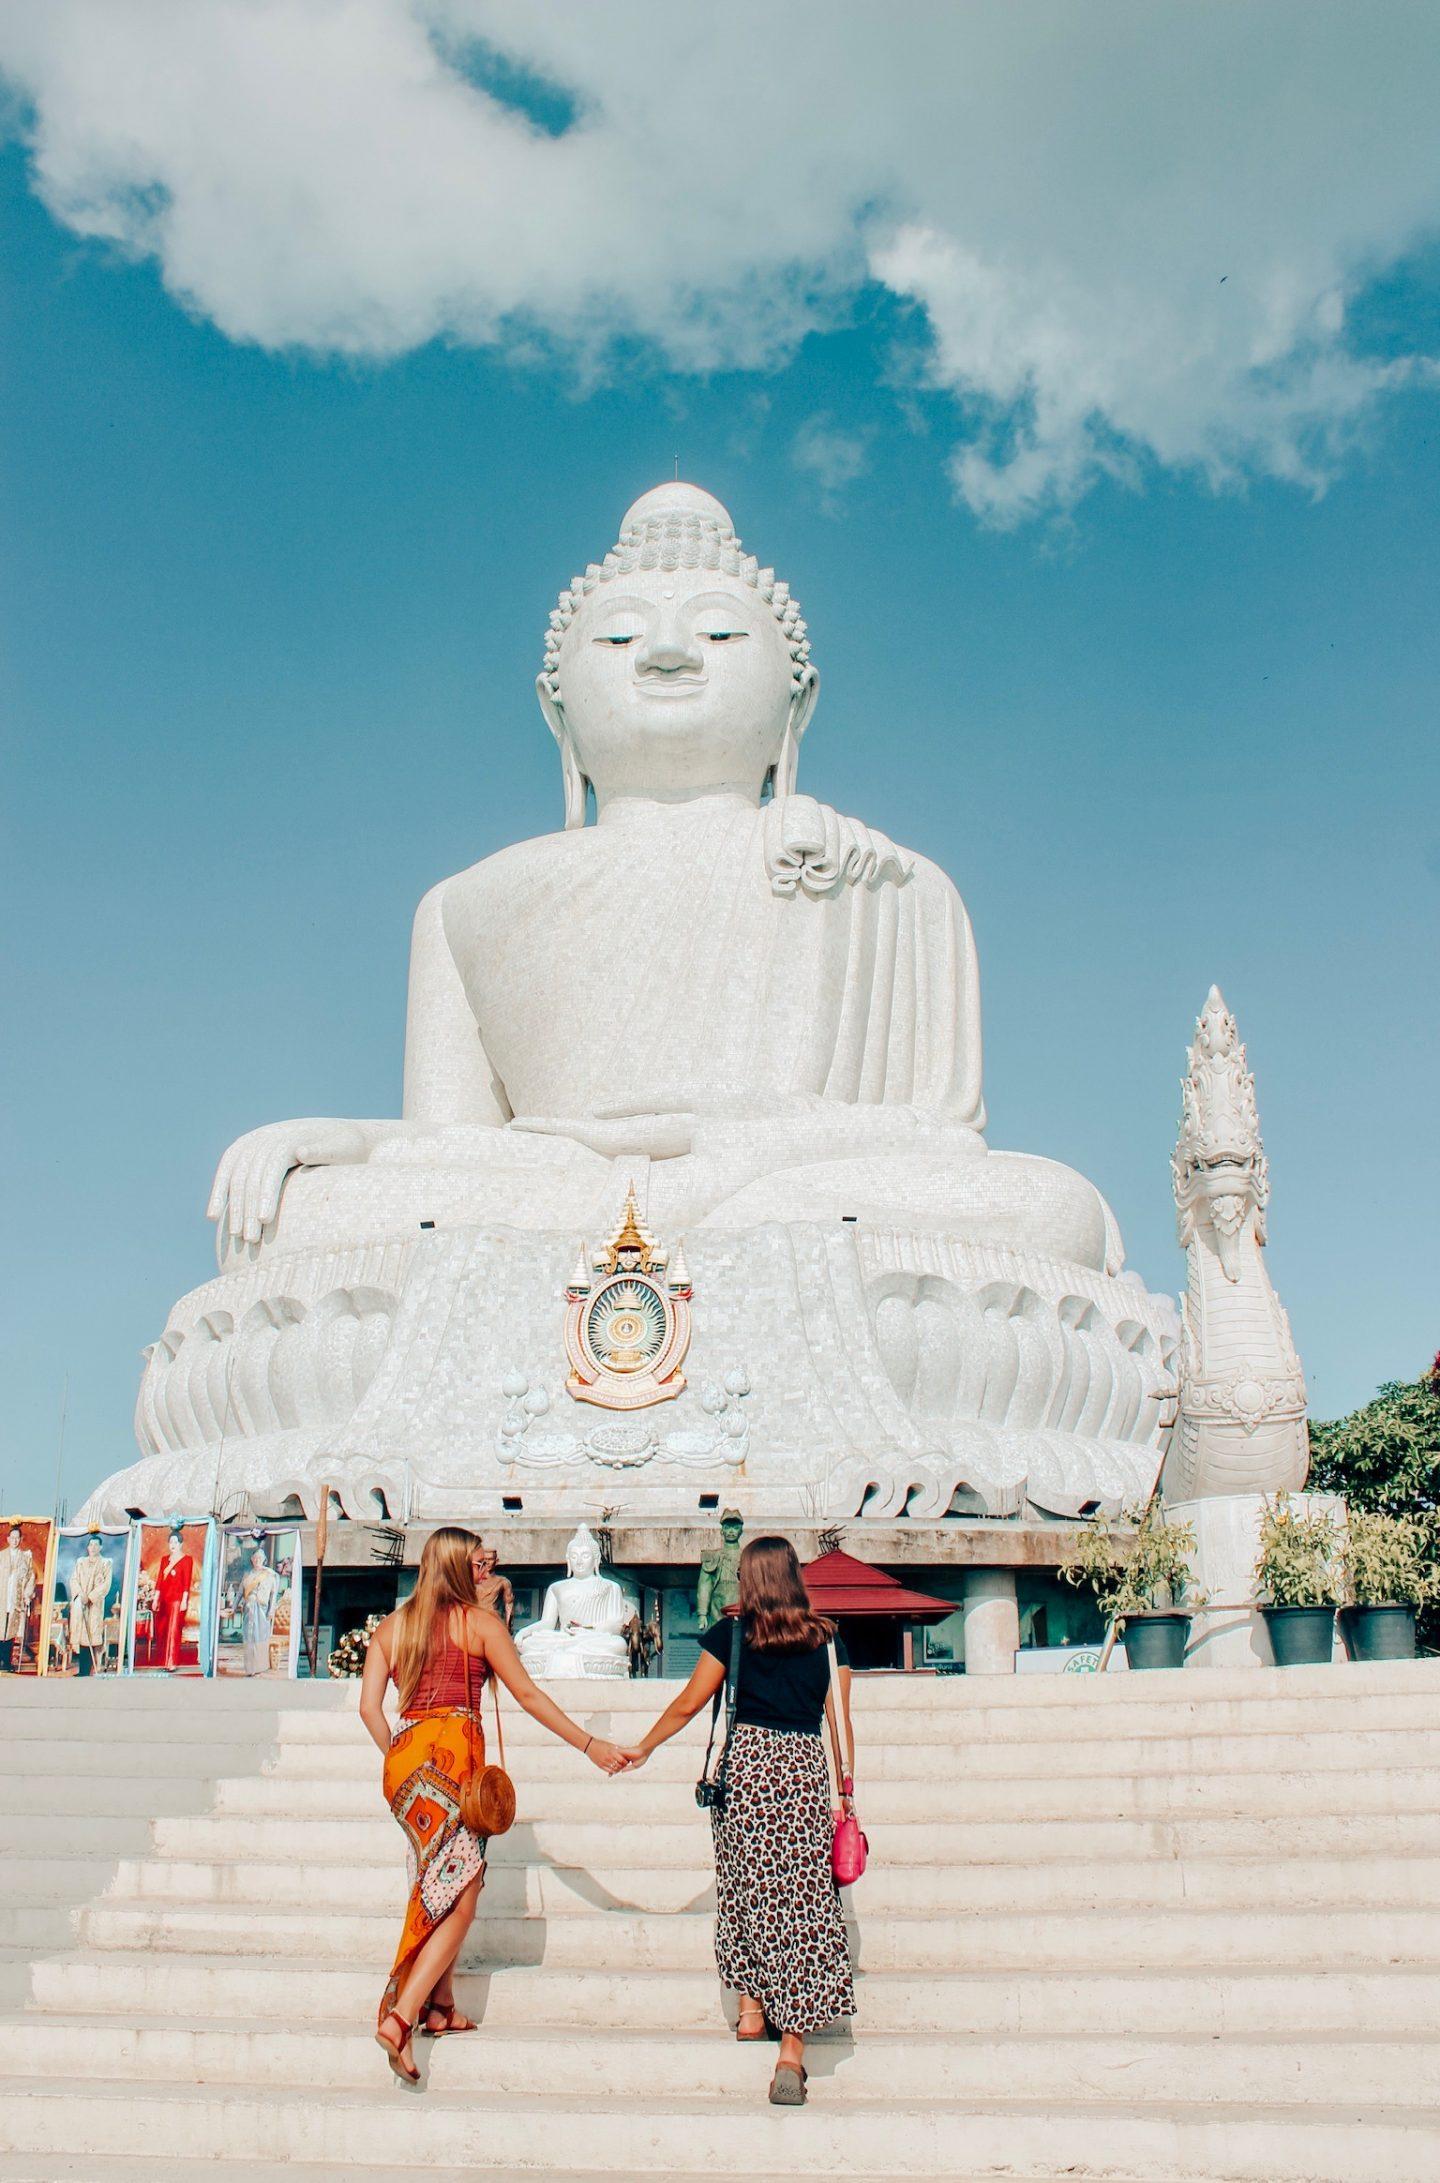 Exploring the Big Buddha temple in Phuket, Thailand!